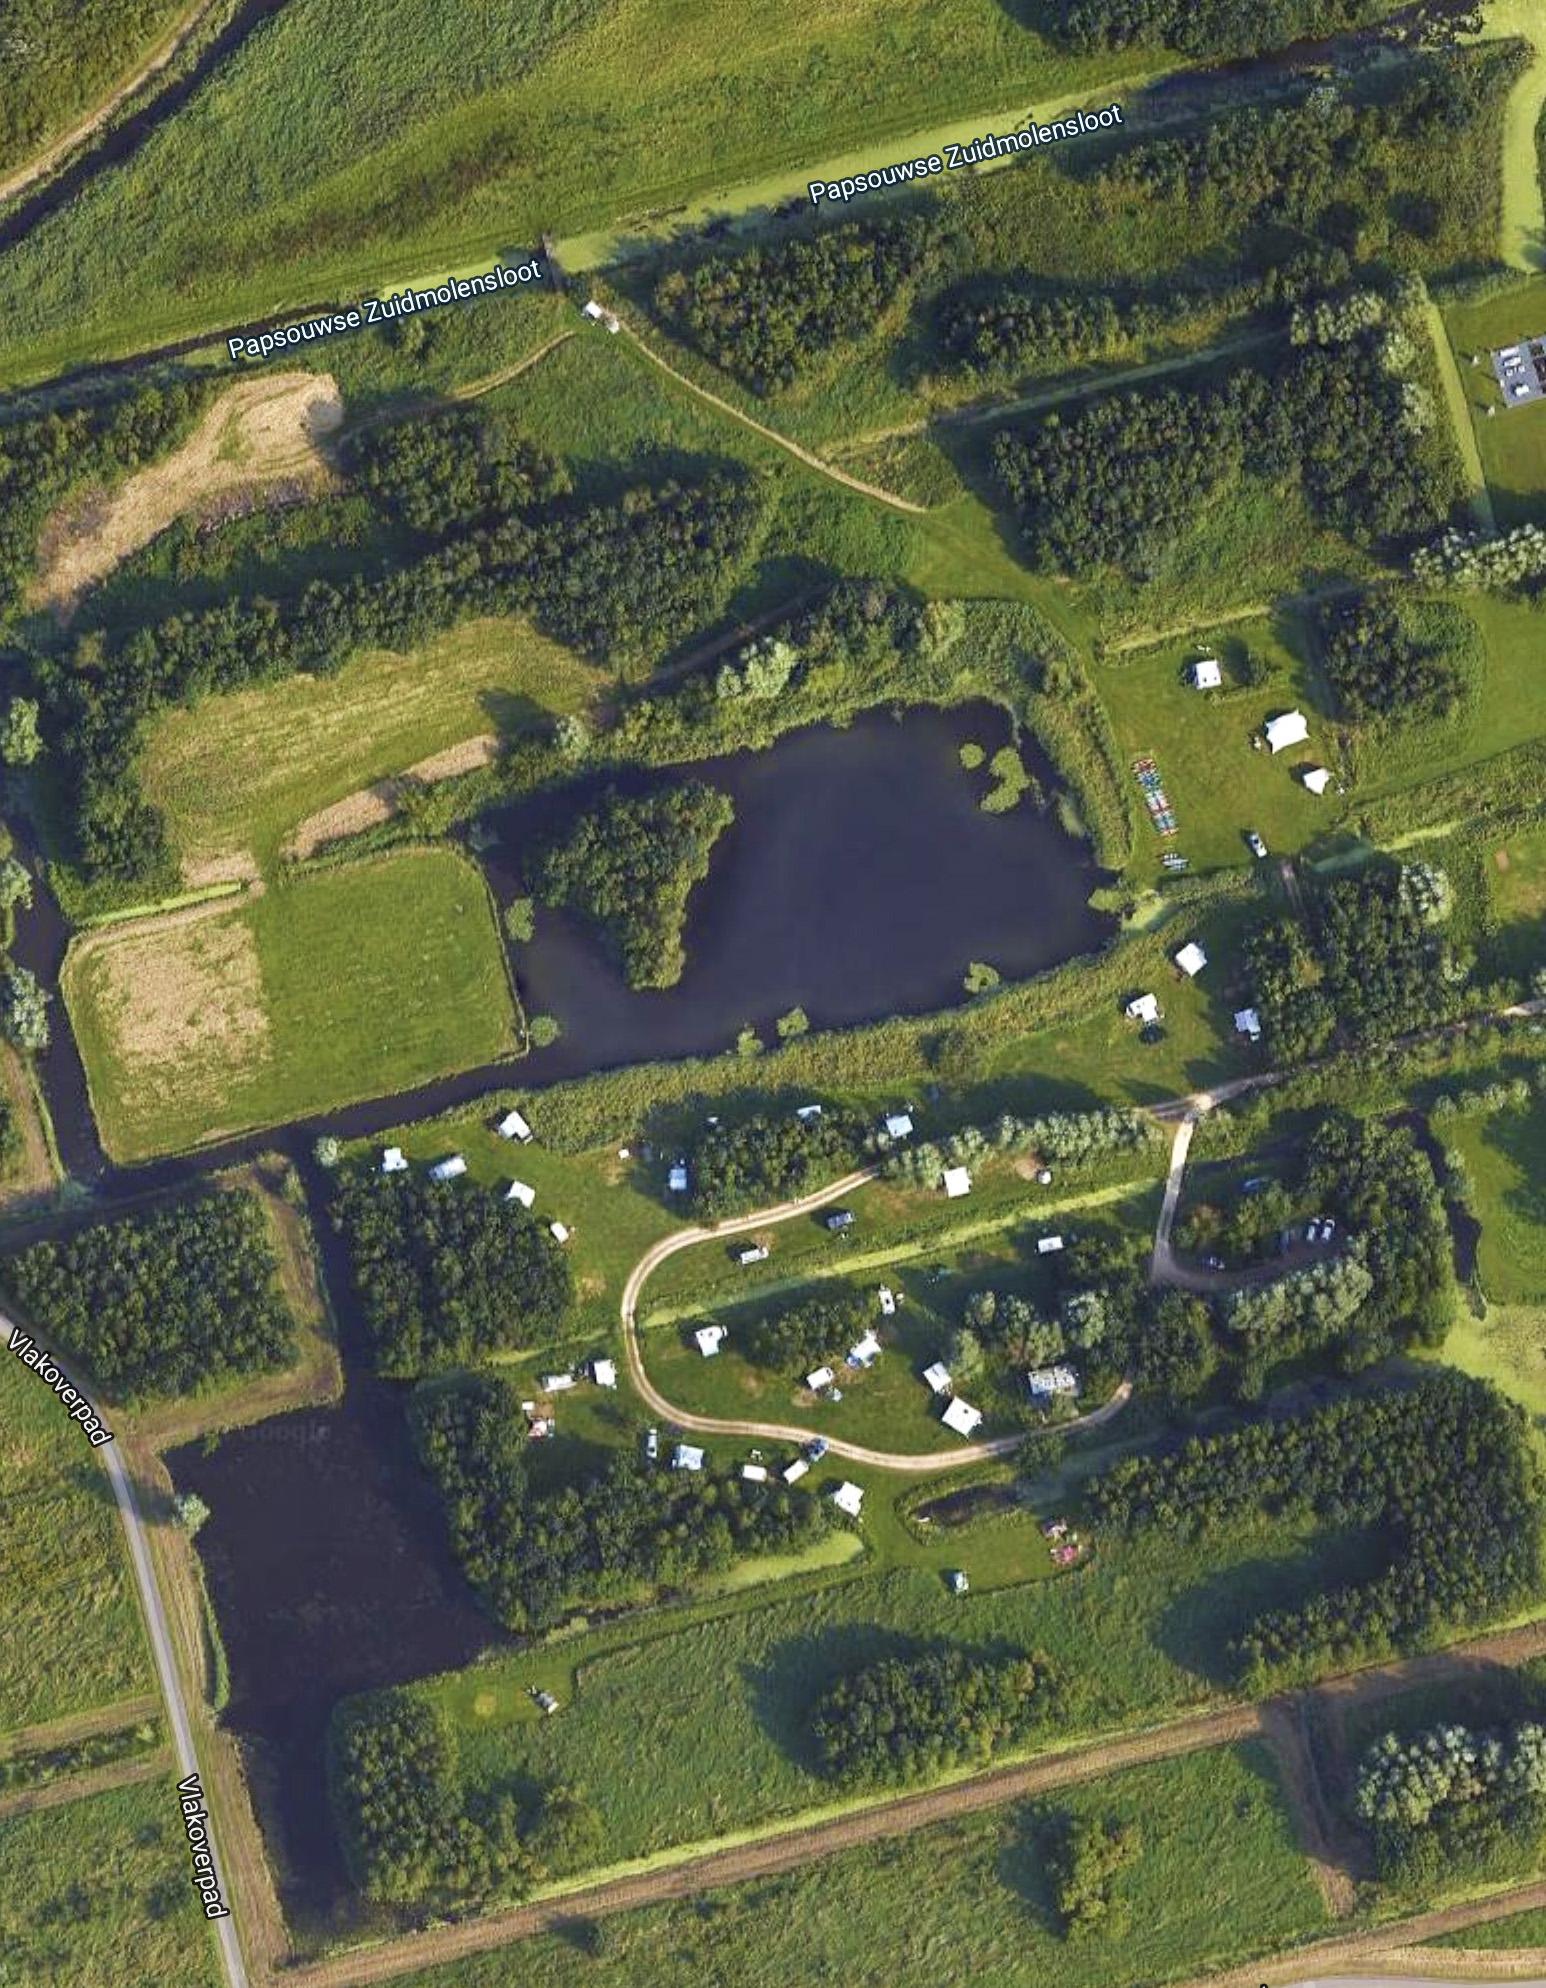 Delflandhoeve, Satelietfoto, plattegrond